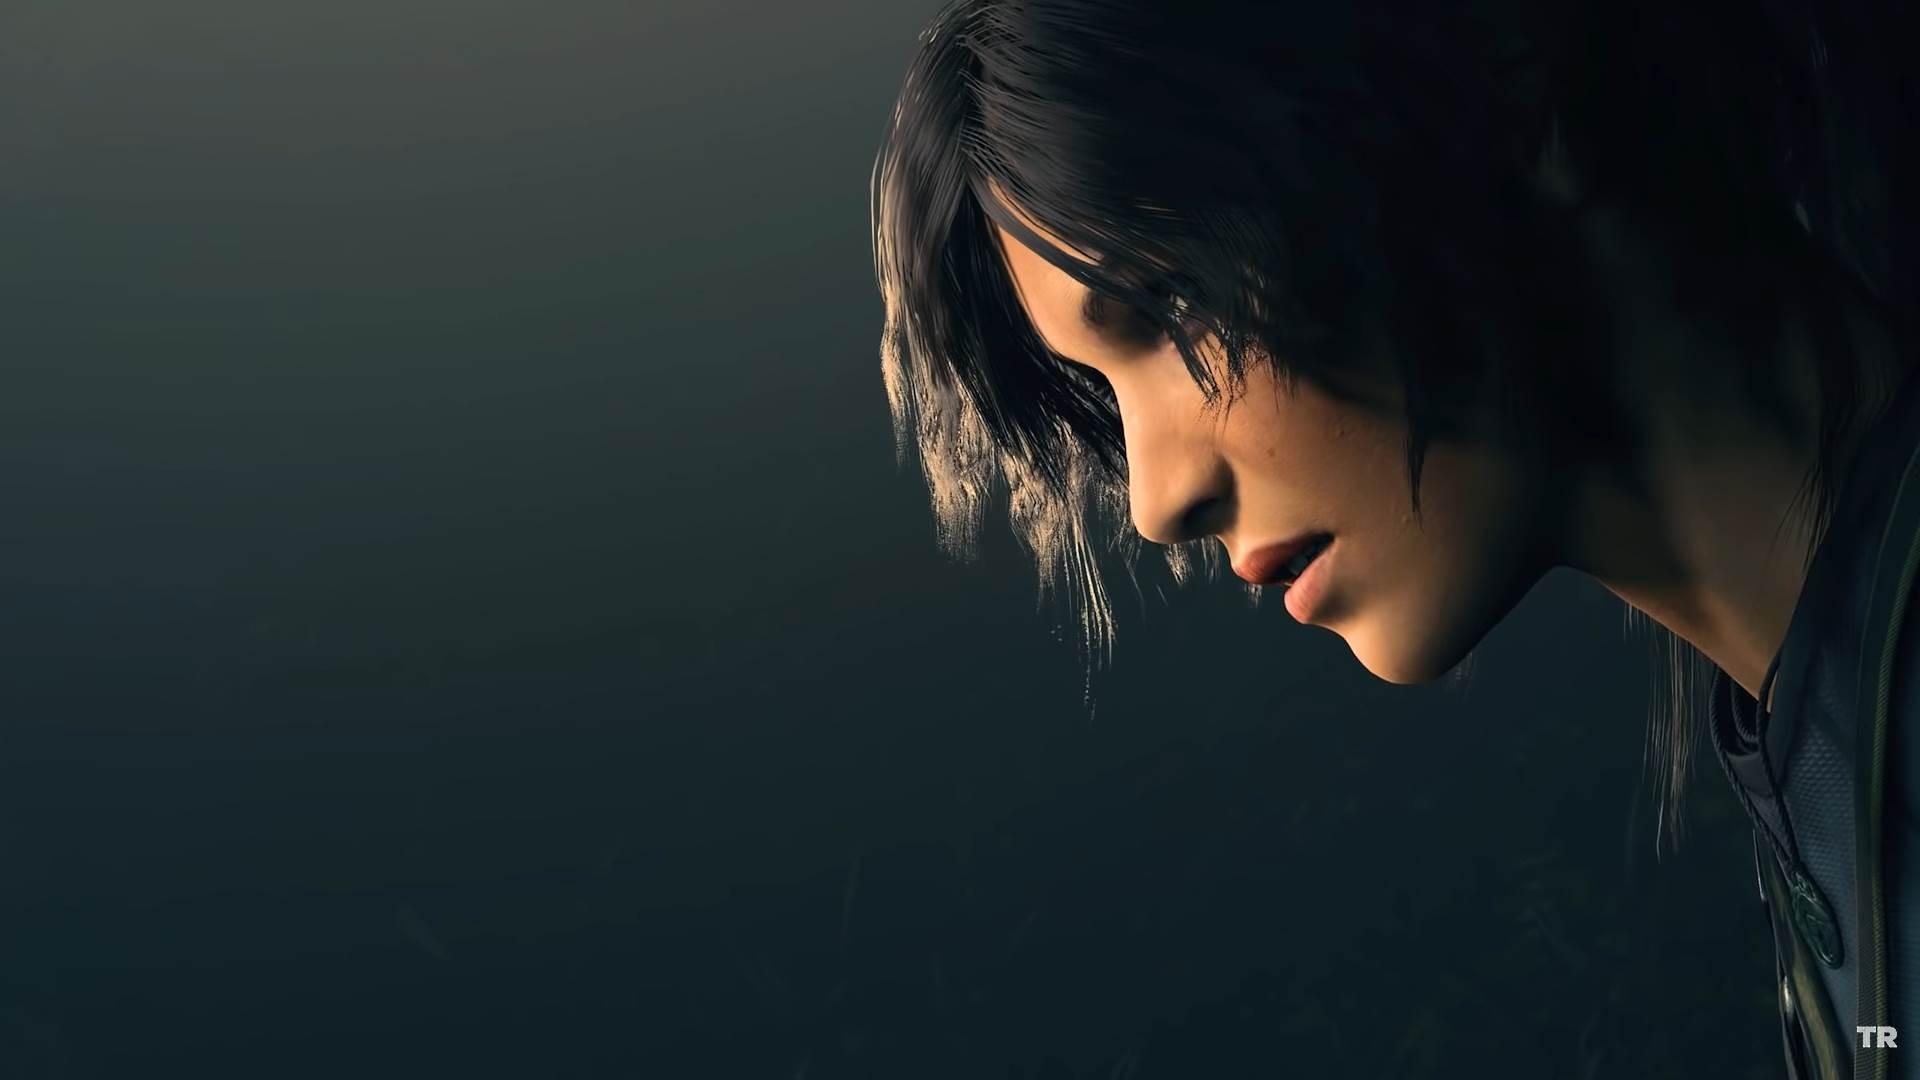 Lara Kroft, Lara Croft, Shadow of the Tomb Raider Definitive Edition 5 novembar igra video slike